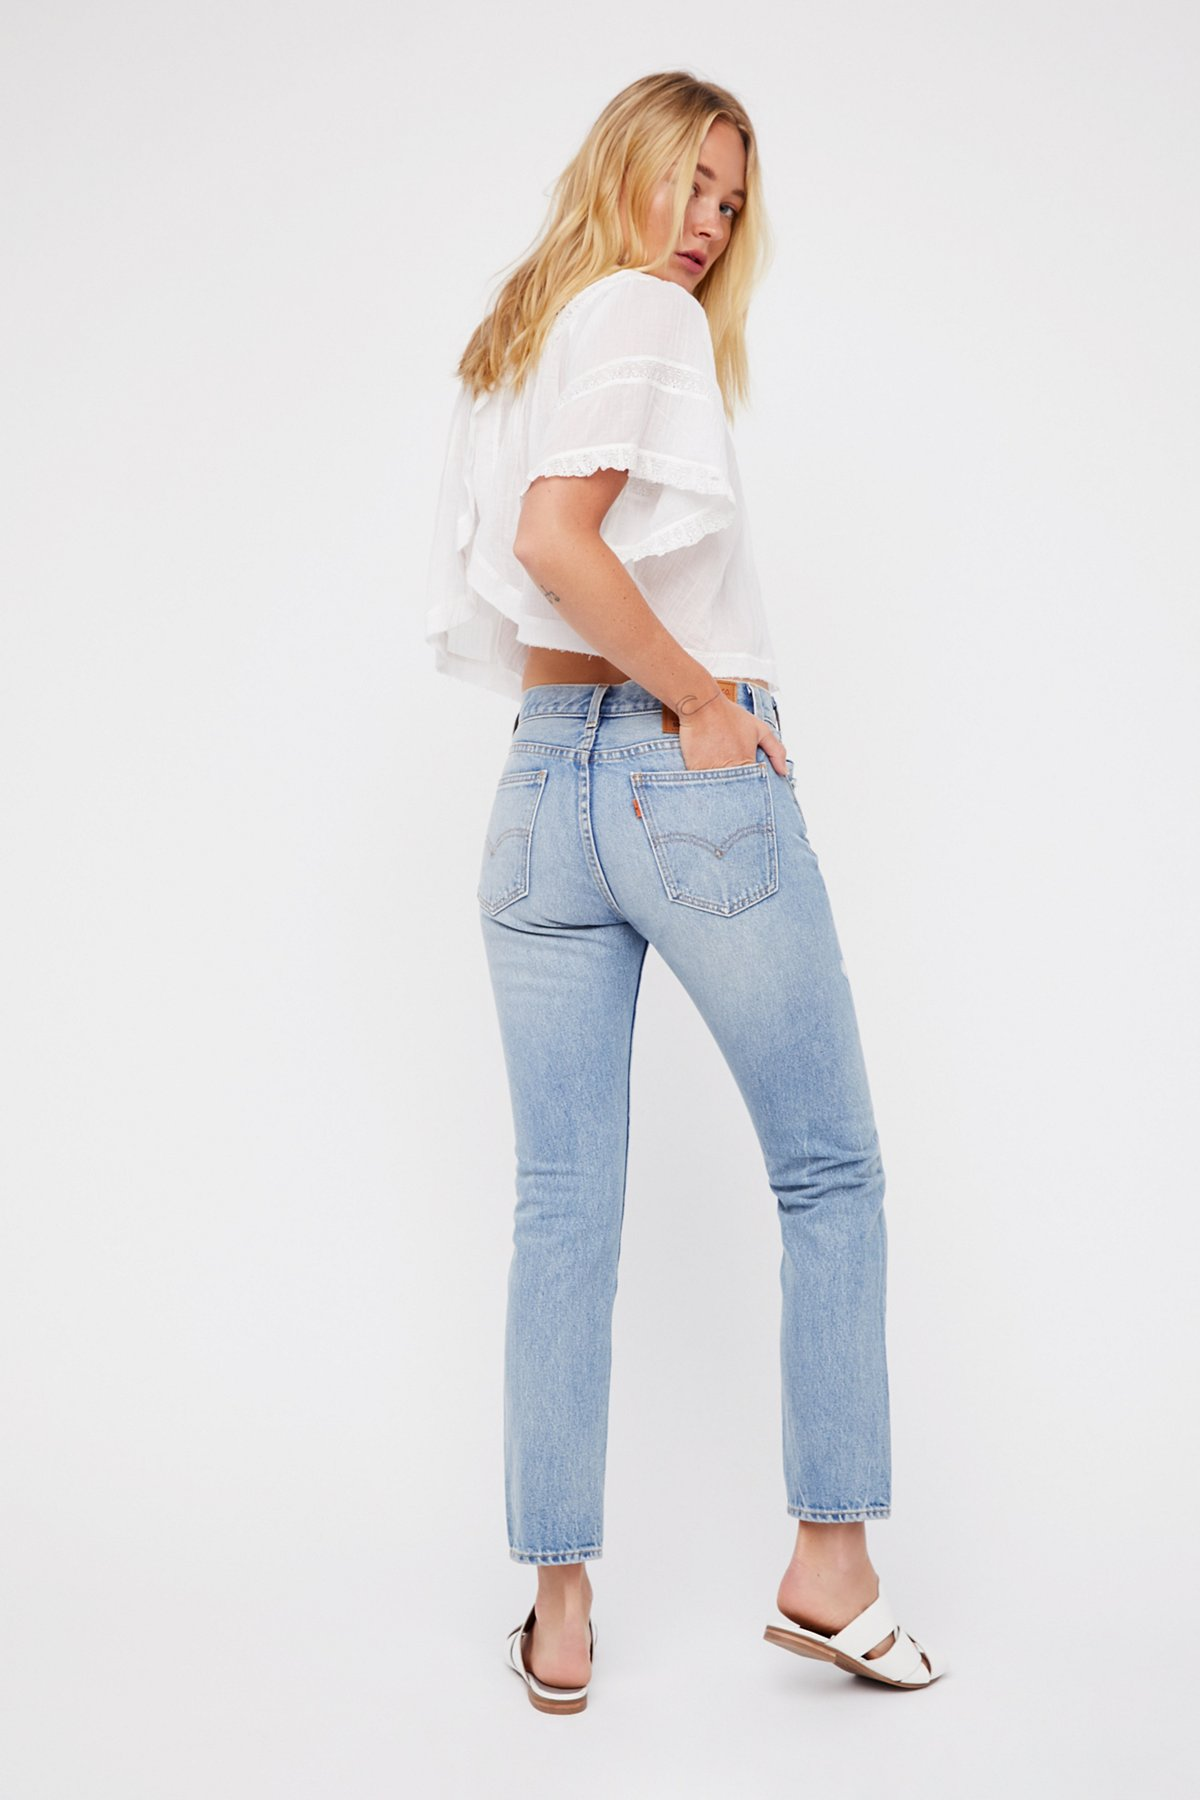 505c Distressed Crop Jeans